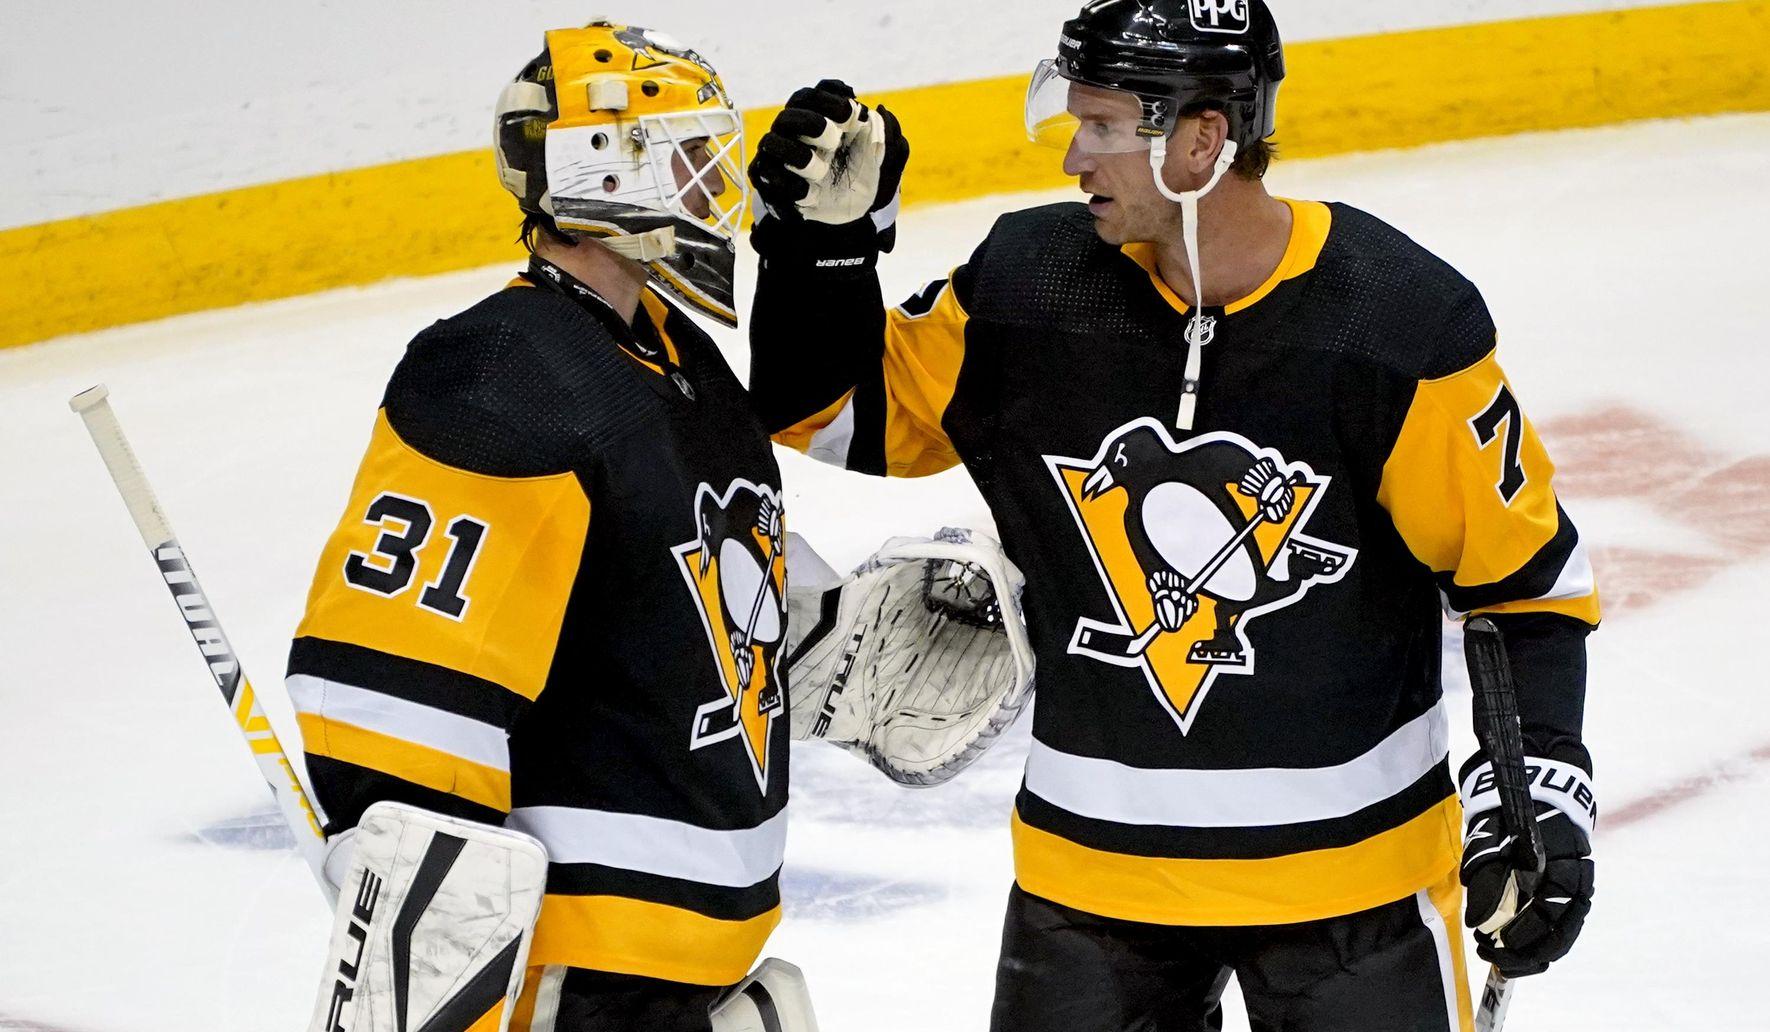 Sabres_penguins_hockey_25386_c0-126-3000-1875_s1770x1032